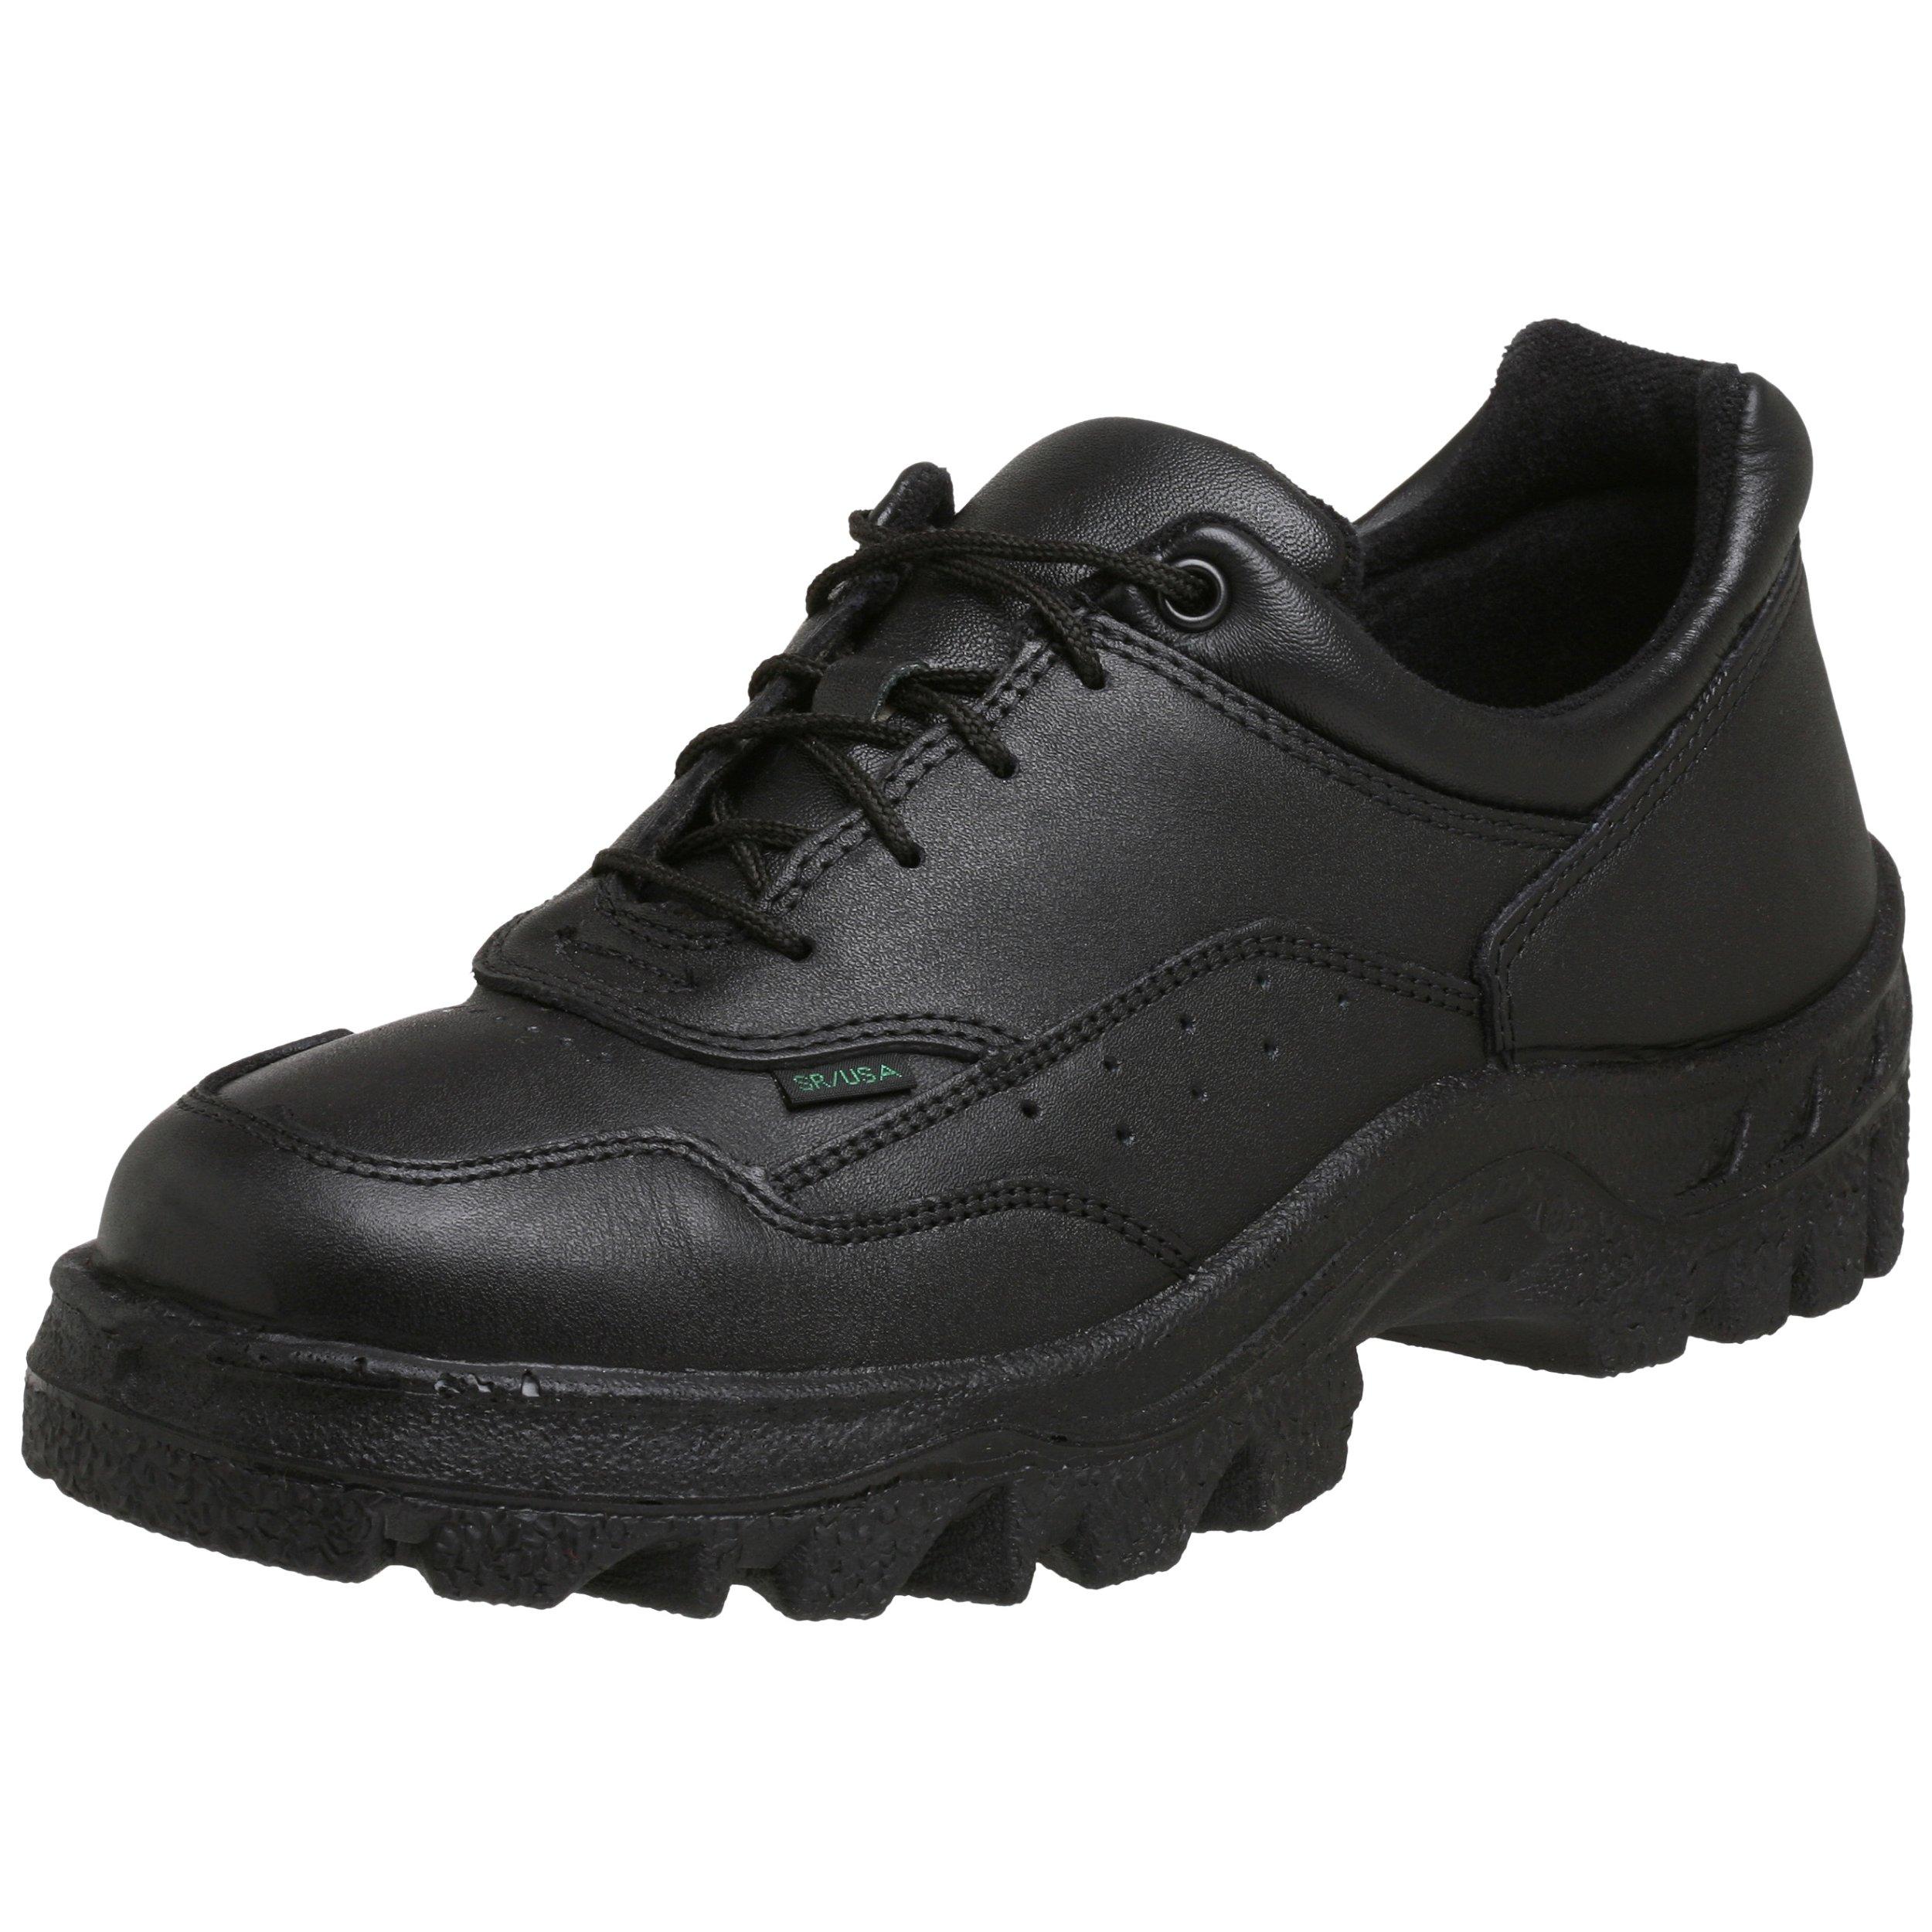 Rocky Duty Men's TMC Athletic Oxford,Black,12 W